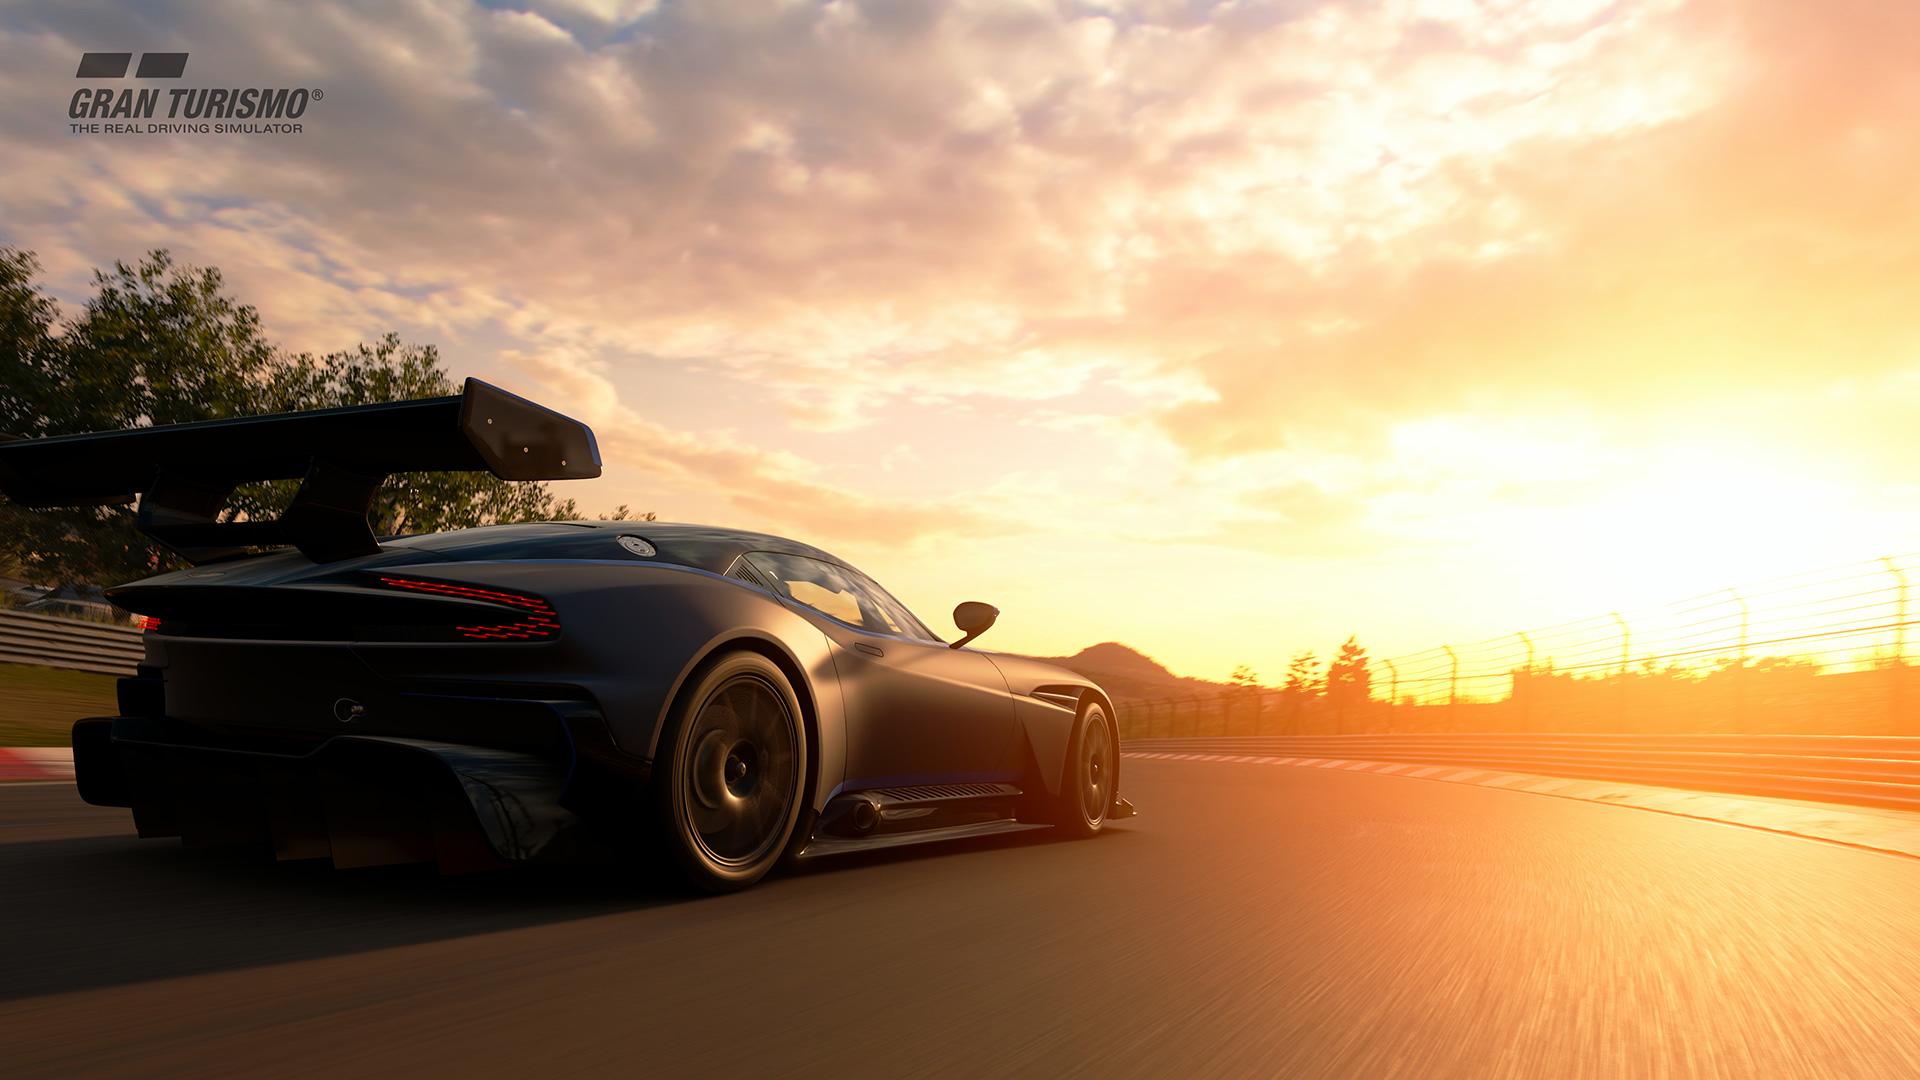 Gran Turismo Sport Iphone Wallpaper: Aston Martin Vulcan - GT SPORT HD Wallpaper